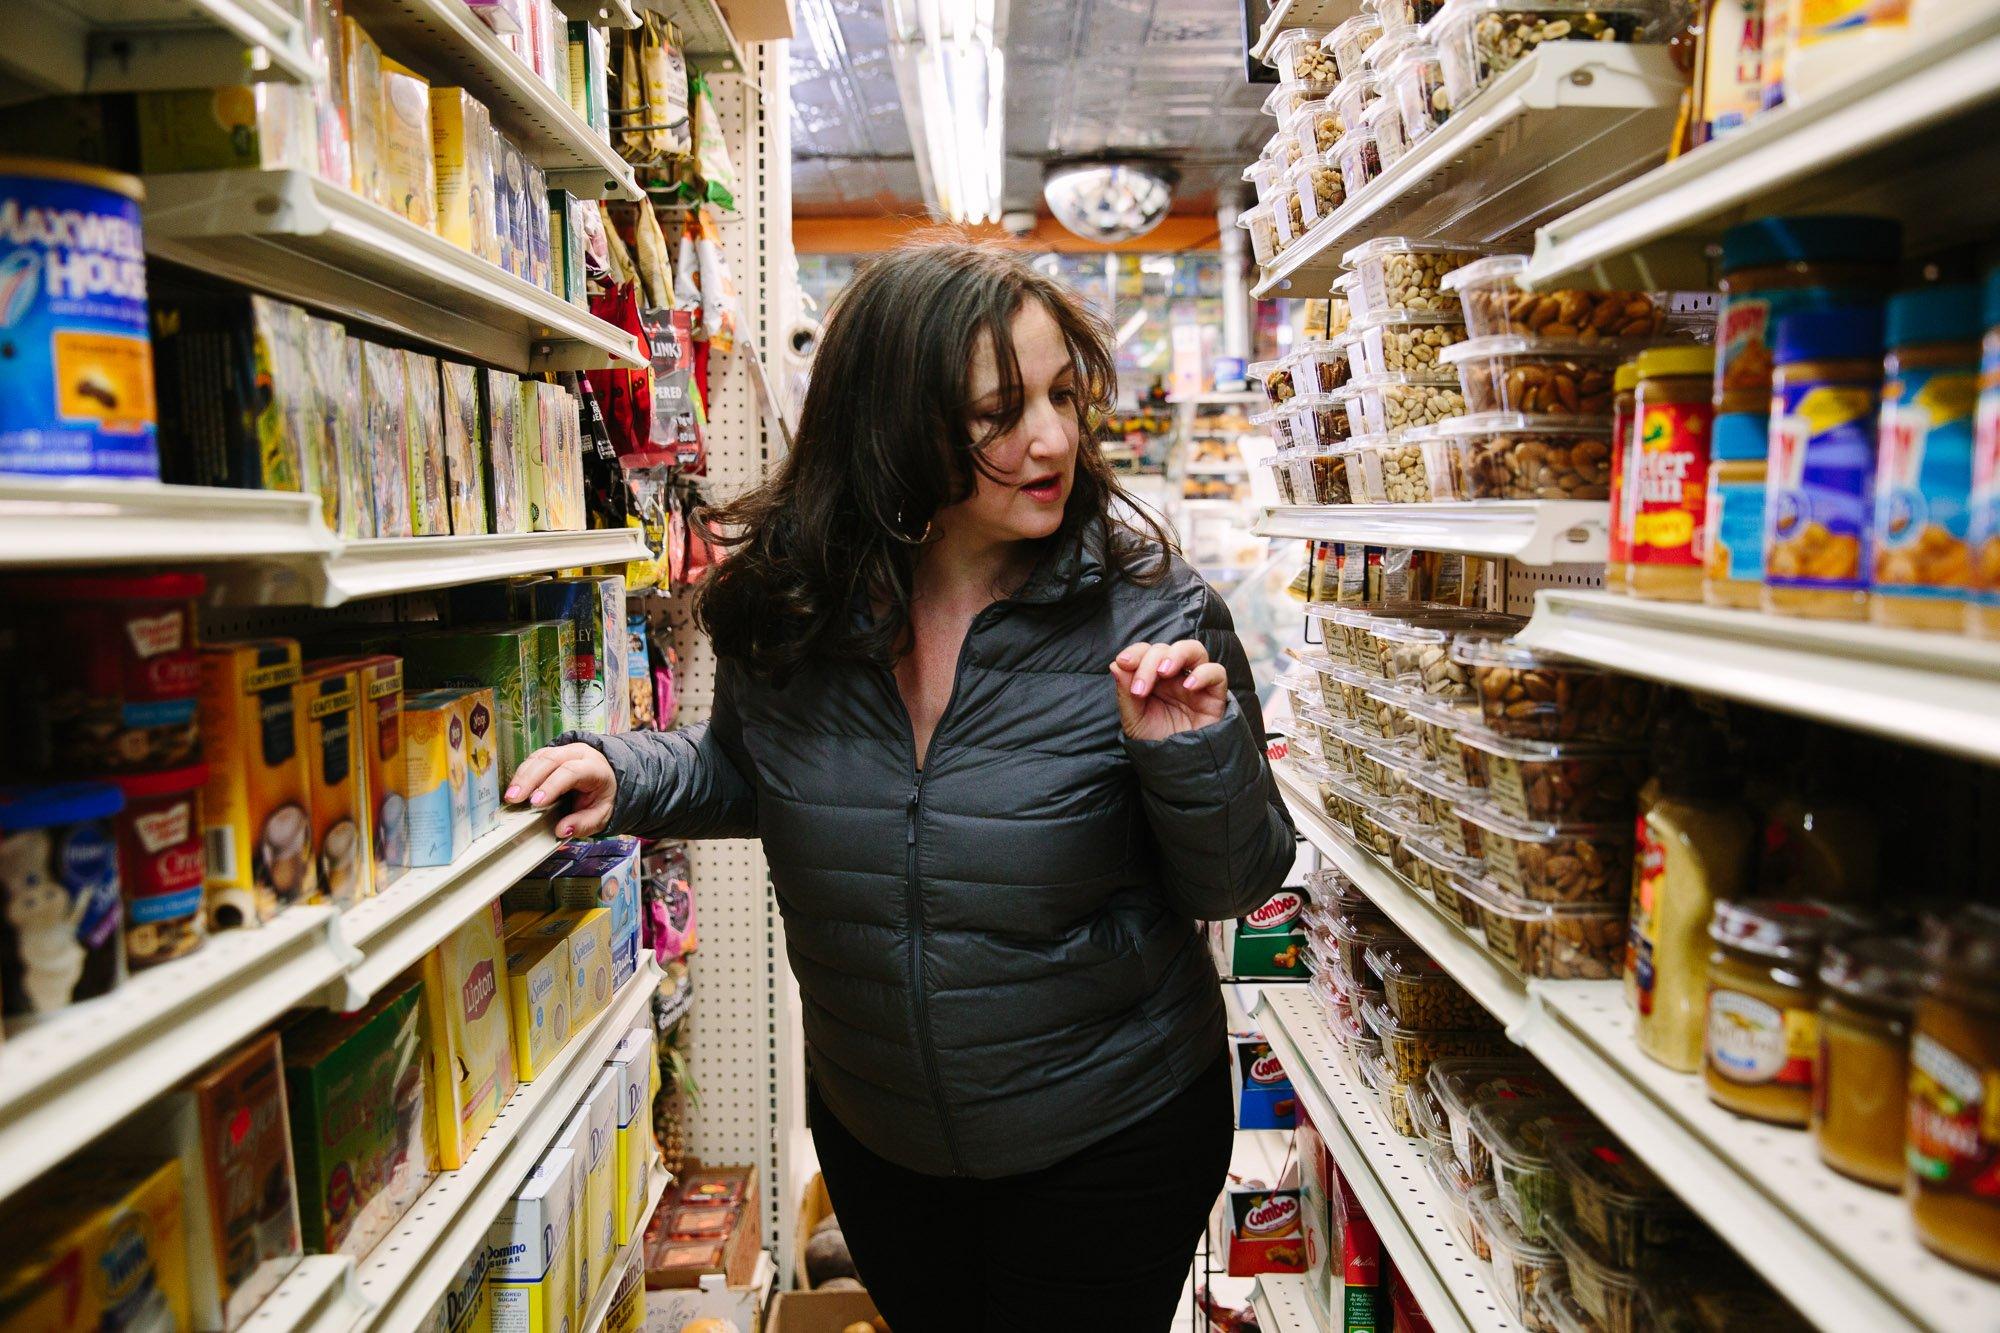 Smitten Kitchen Deb Perelman A Bodega Challenge With Smitten Kitchen  A Cup Of Jo